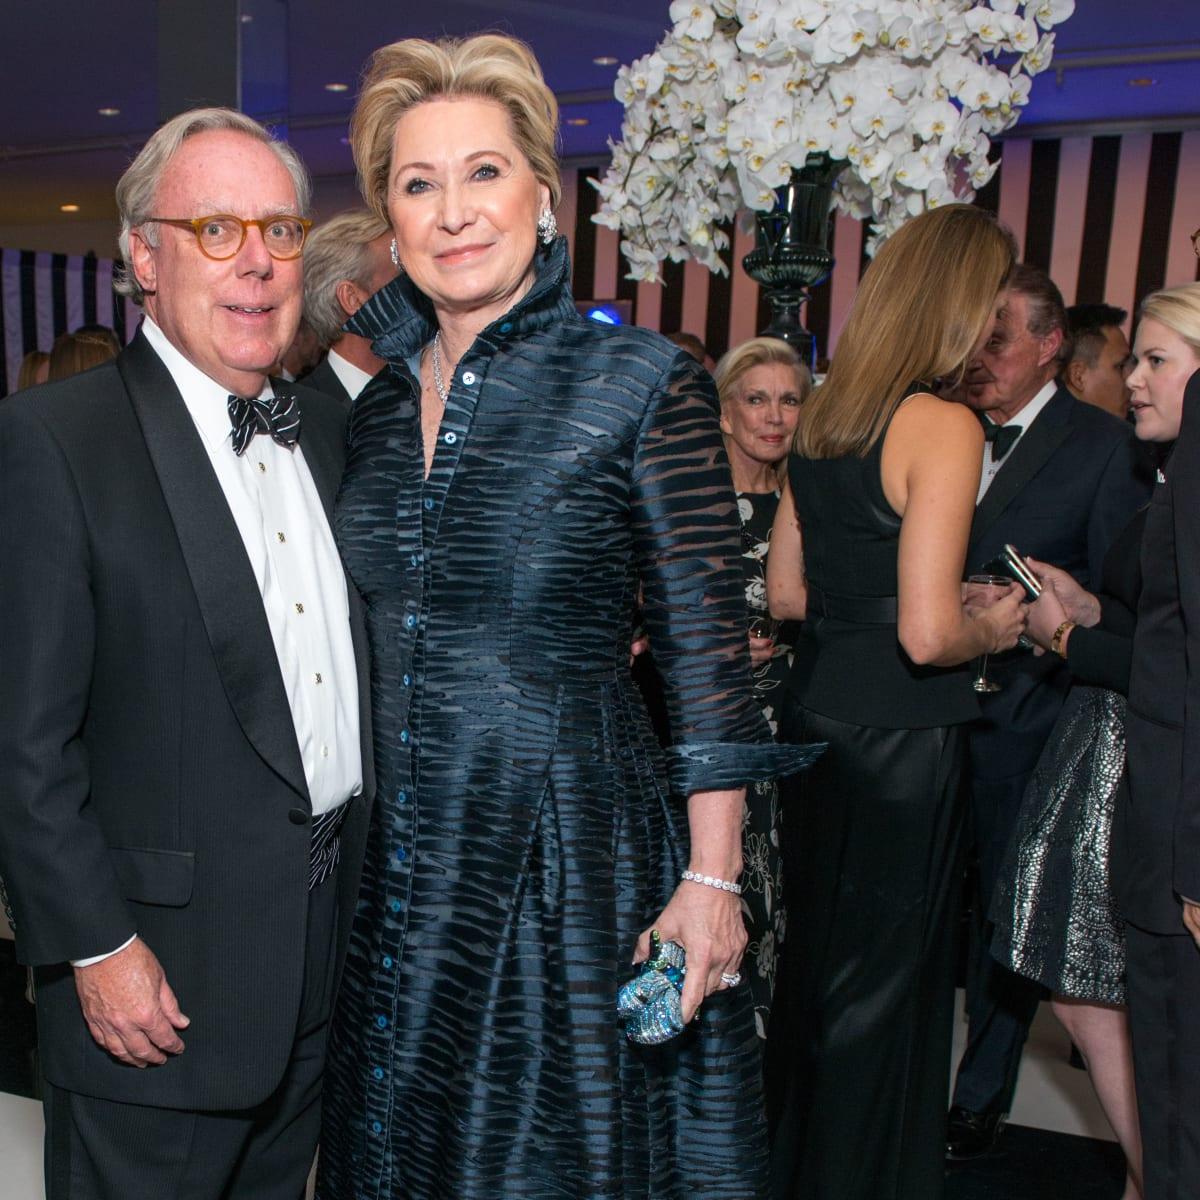 News, Shelby, Museum of Fine Arts gala, Oct. 2015, Mike Linn, Carol Linn